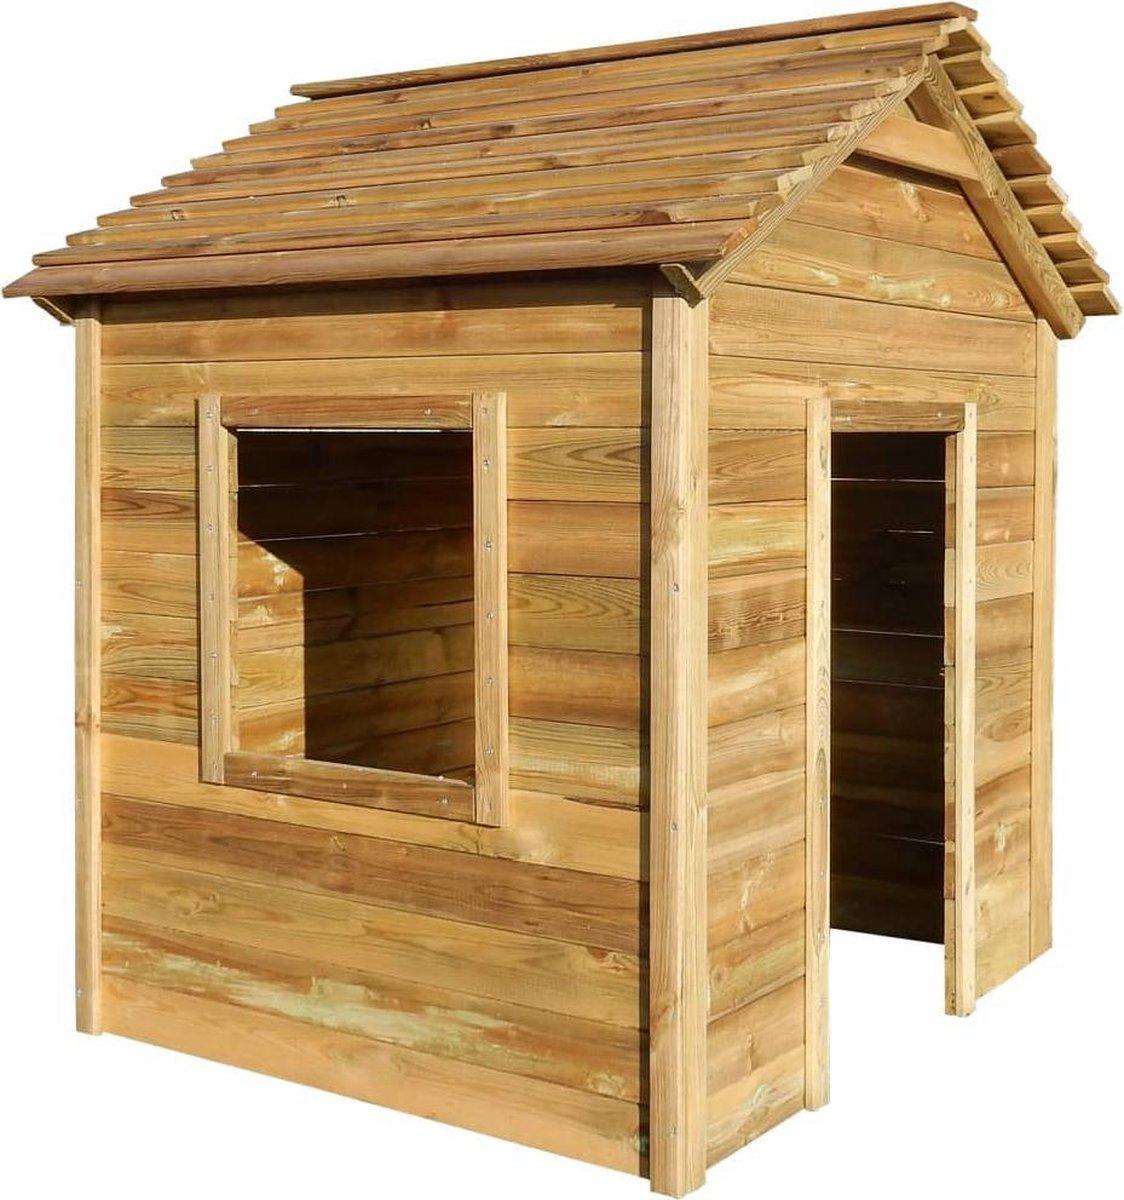 Buitenspeelhuis 123x120x146 cm FSC grenenhout